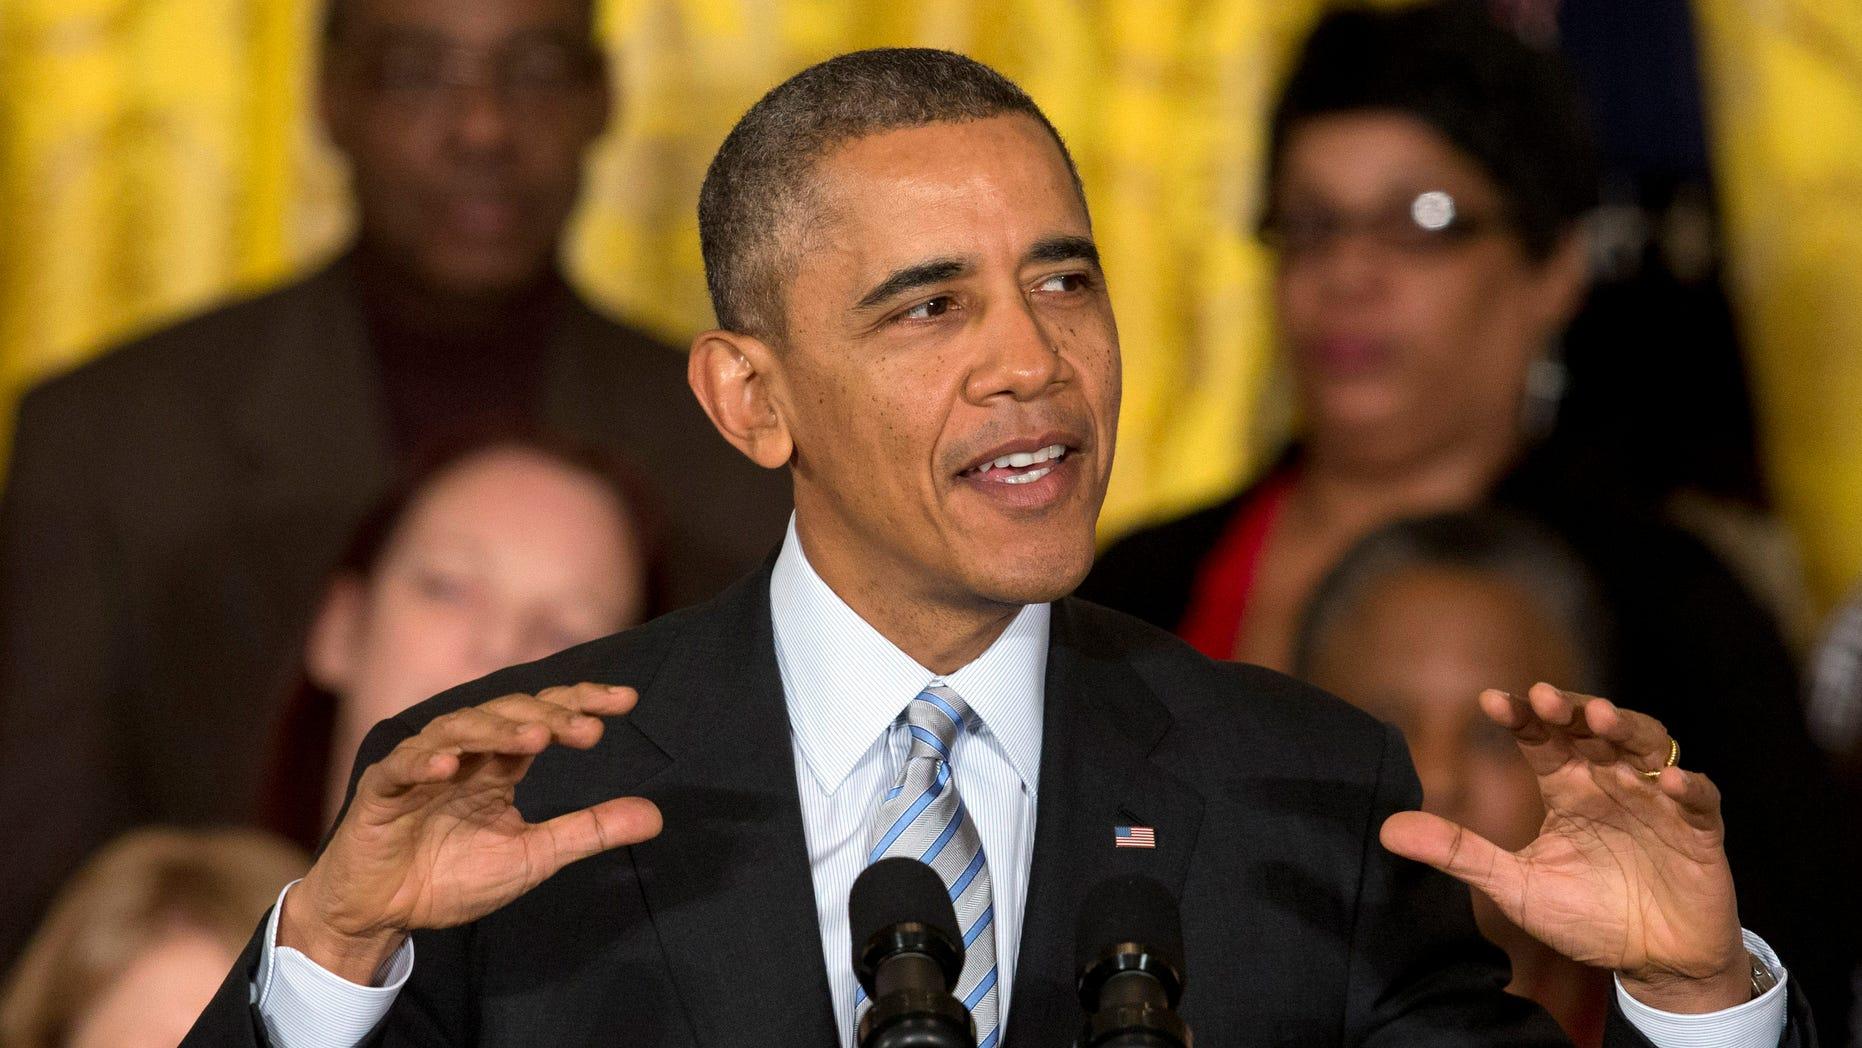 Feb. 12, 2014 President Obama speaks in the East Room of the White House.